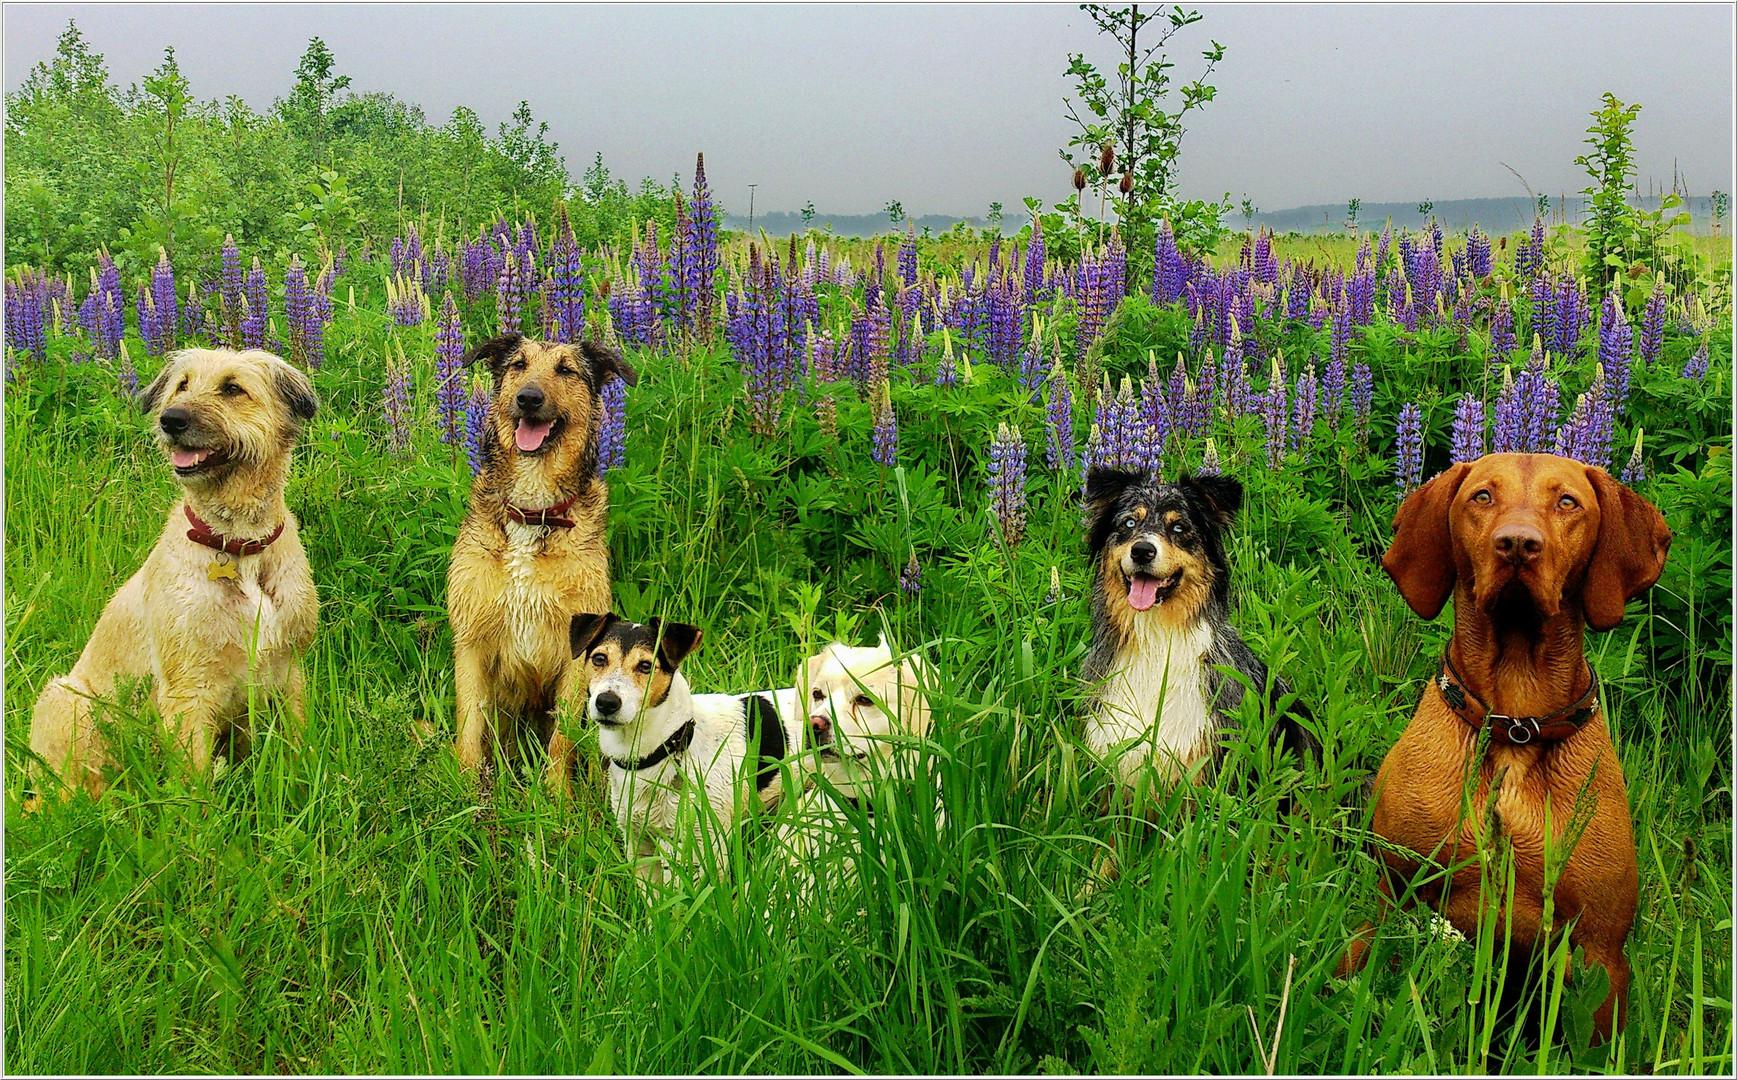 Klassenausflug der Hundeschule zu den Mittwochsblümchen